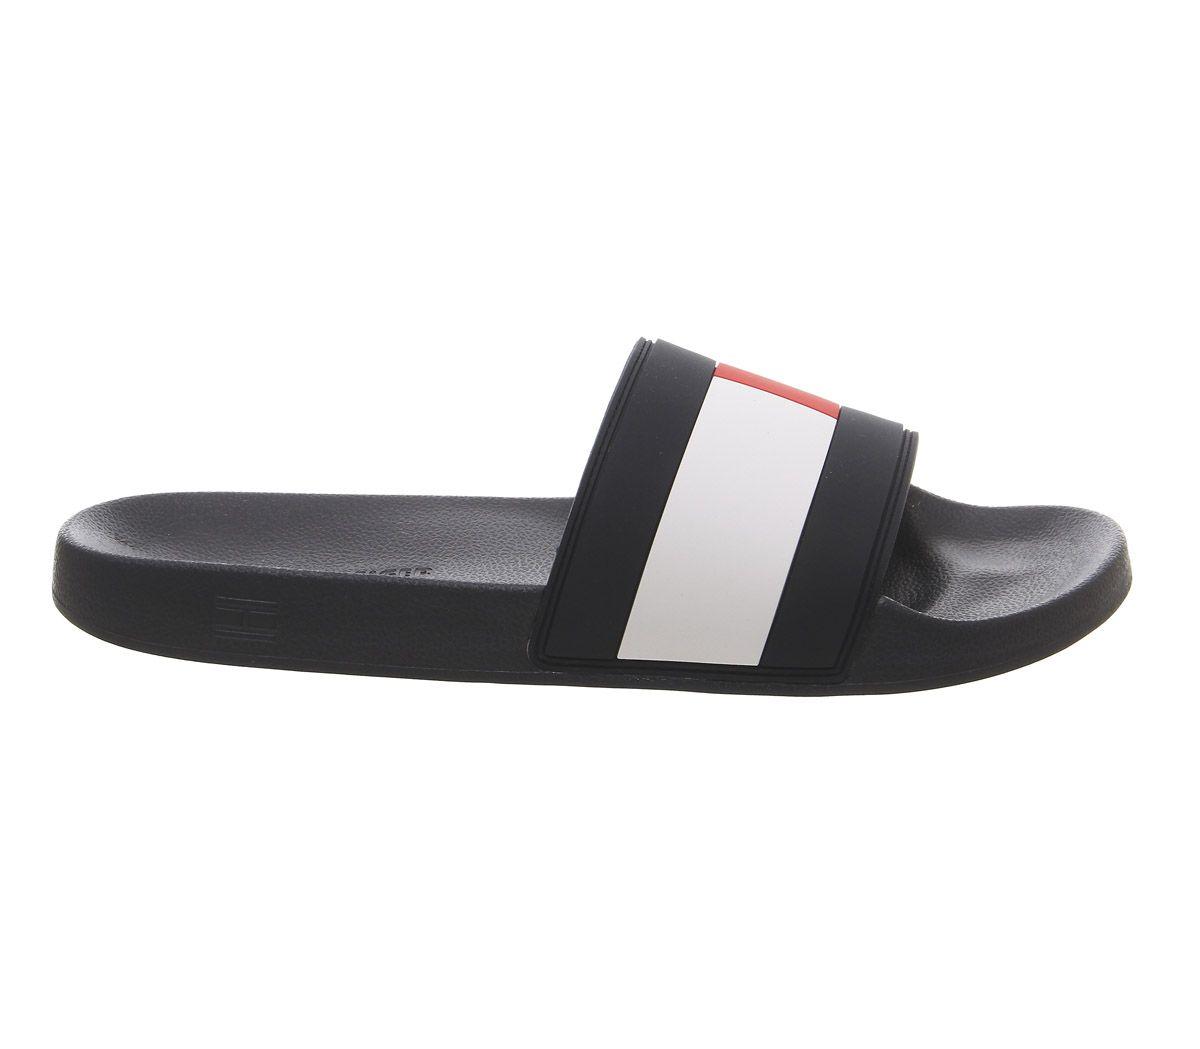 0db844e7 Sentinel Mens Tommy Hilfiger Flag Pool Slides Navy White Red Sandals